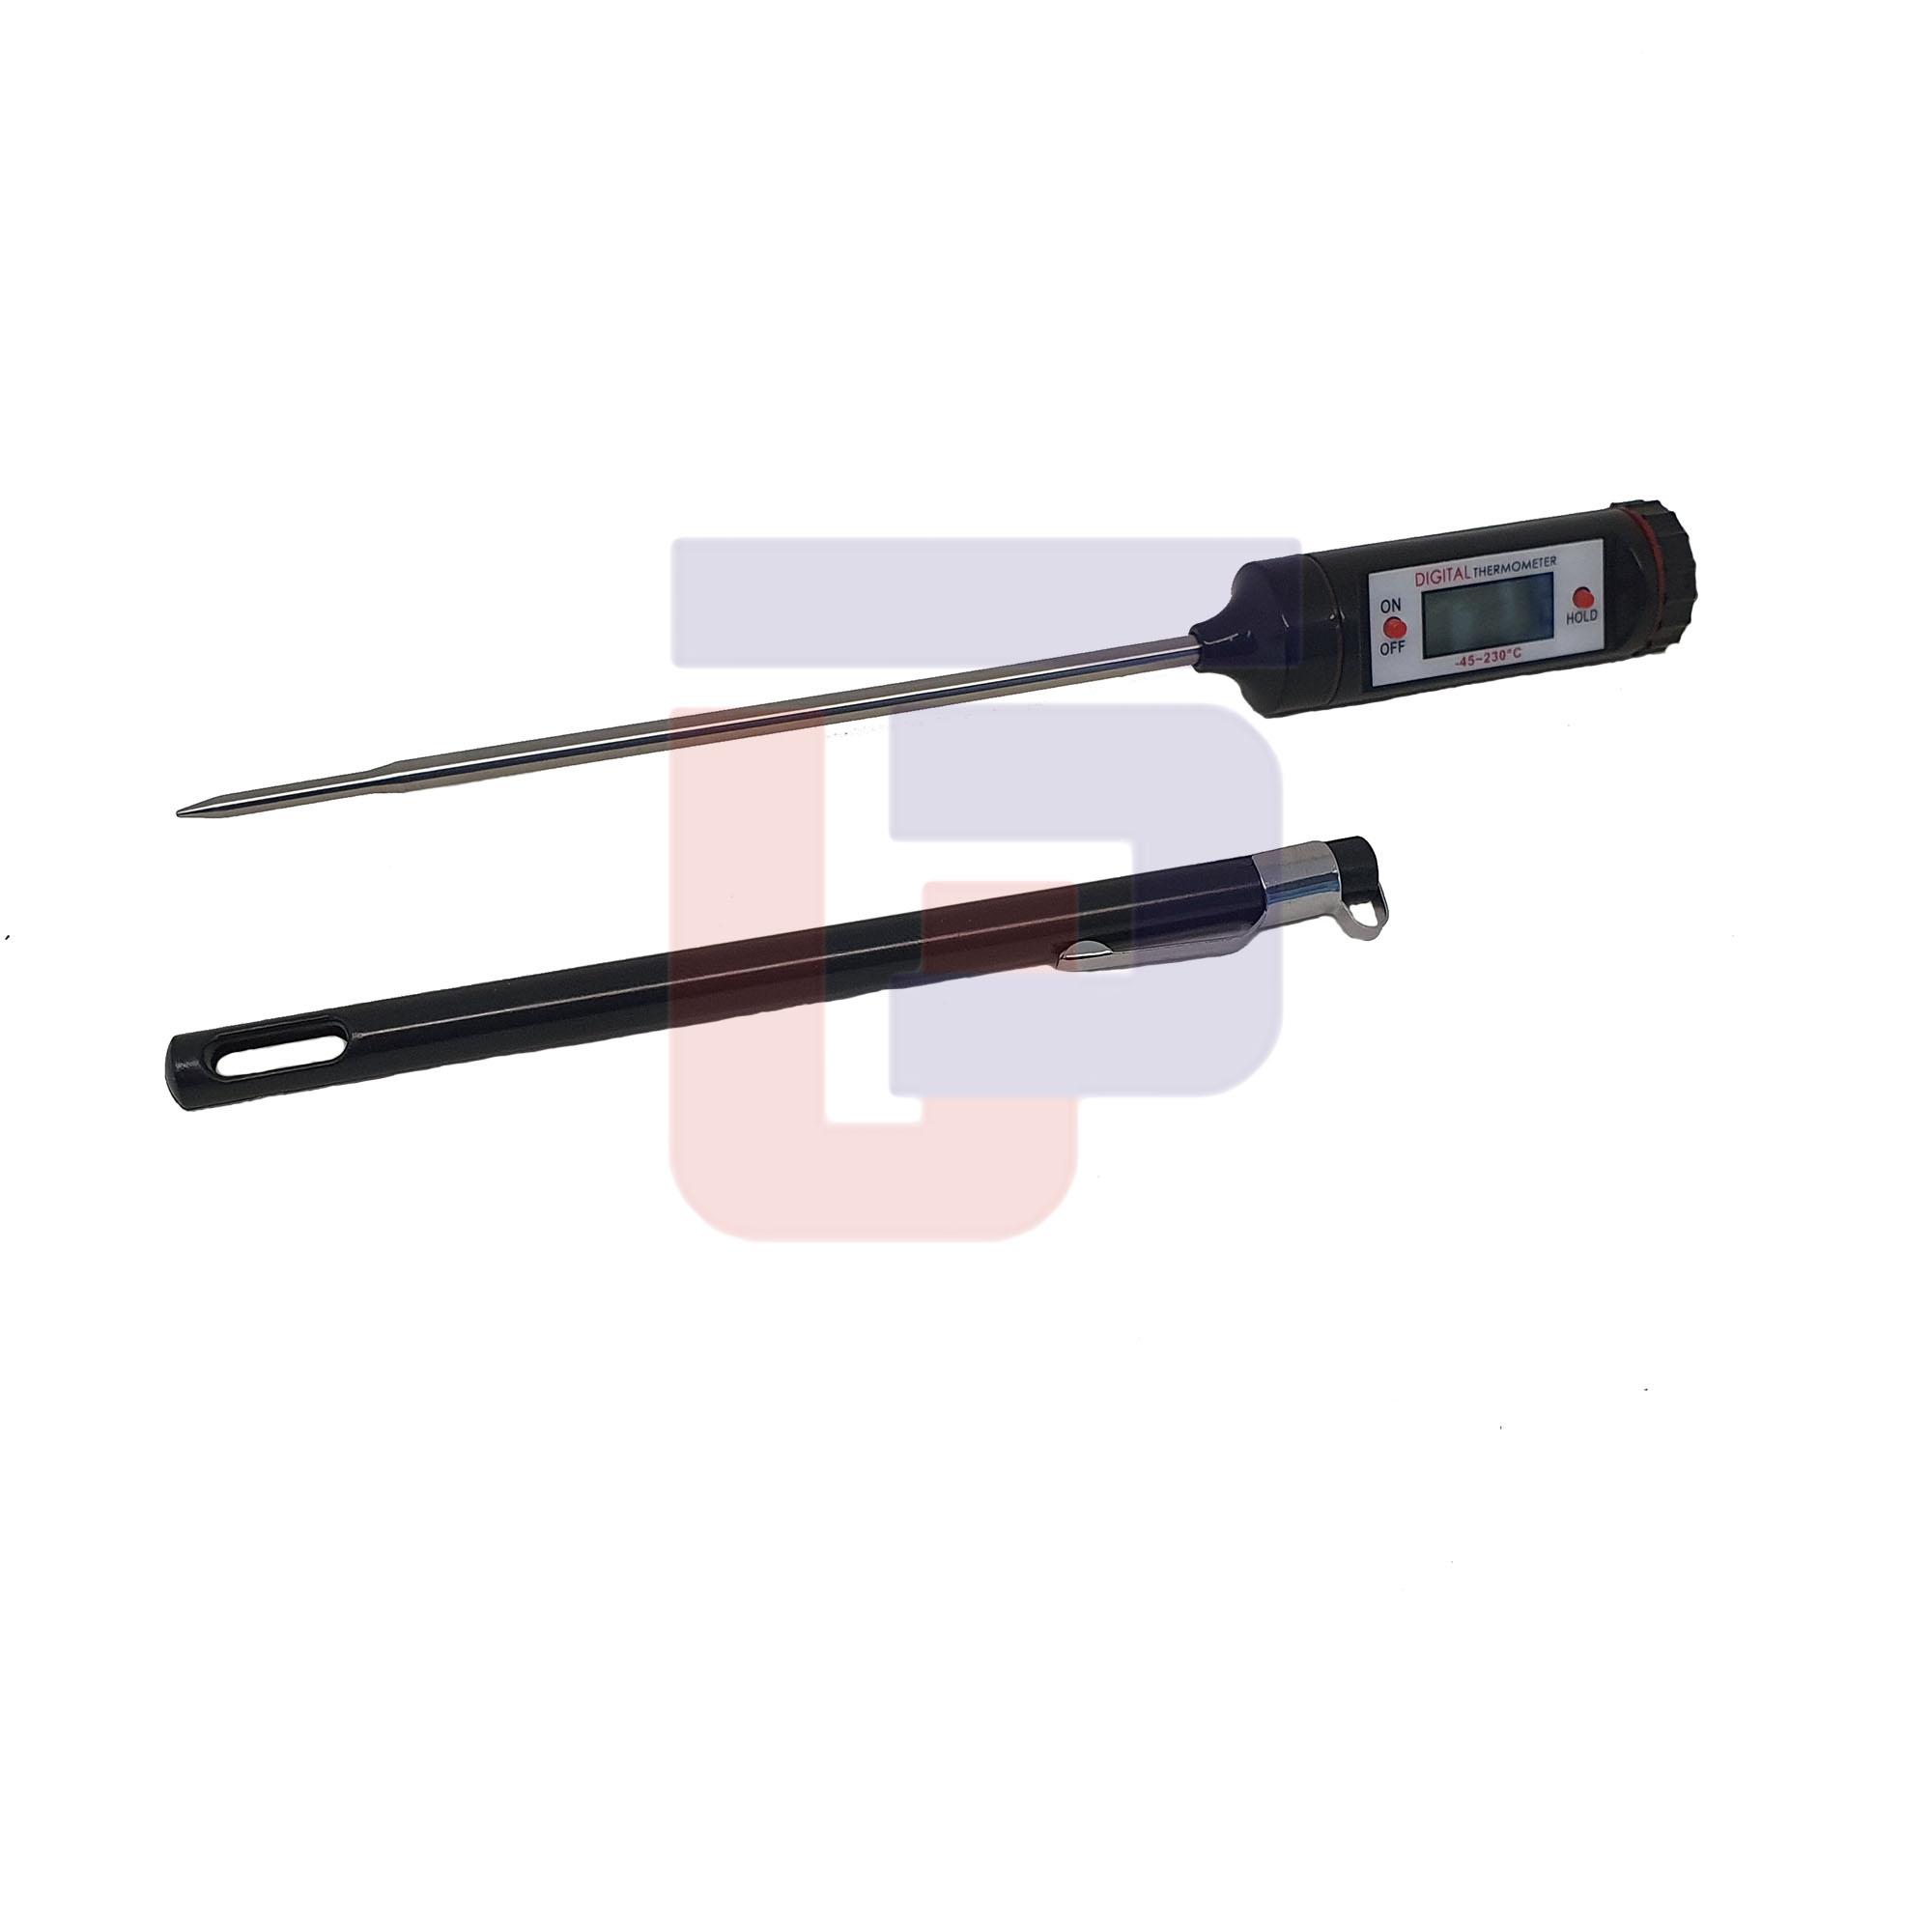 Termômetro Digital Tipo Espeto c/ Capa Protetora Incoterm